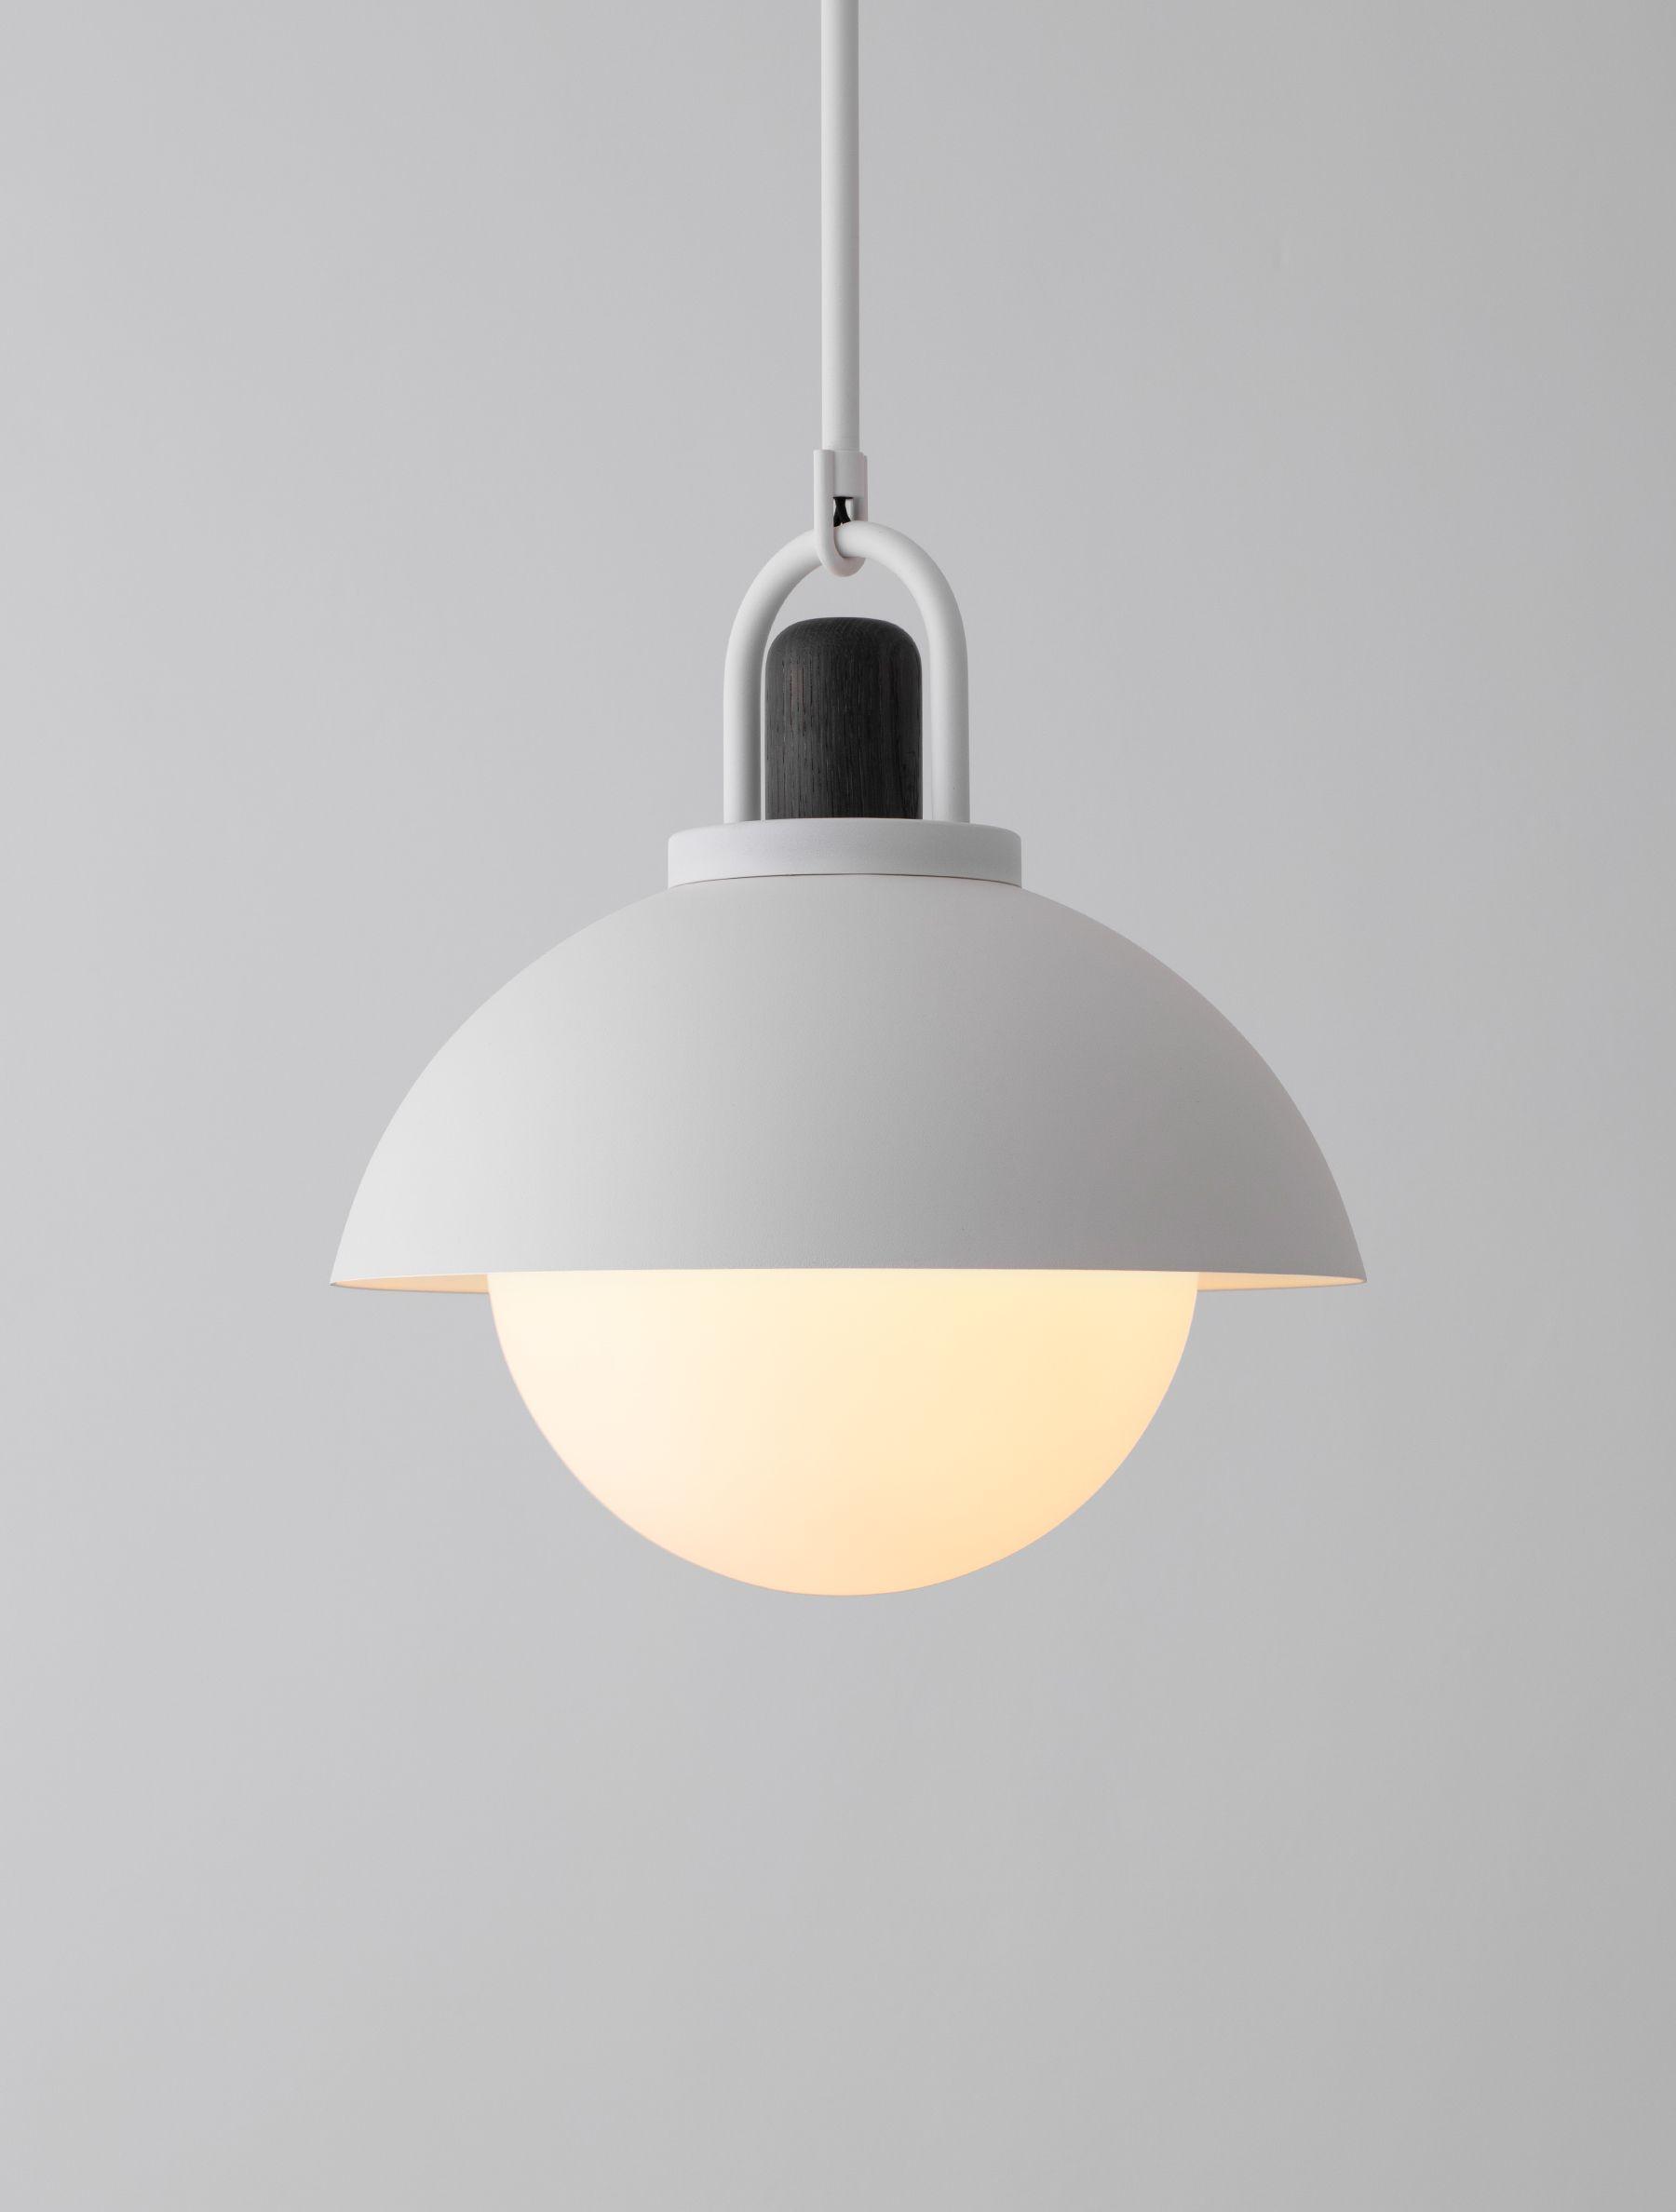 Arc Dome 14 Glass Diffuser Ceramic Lamp Bedroom Ceiling Light